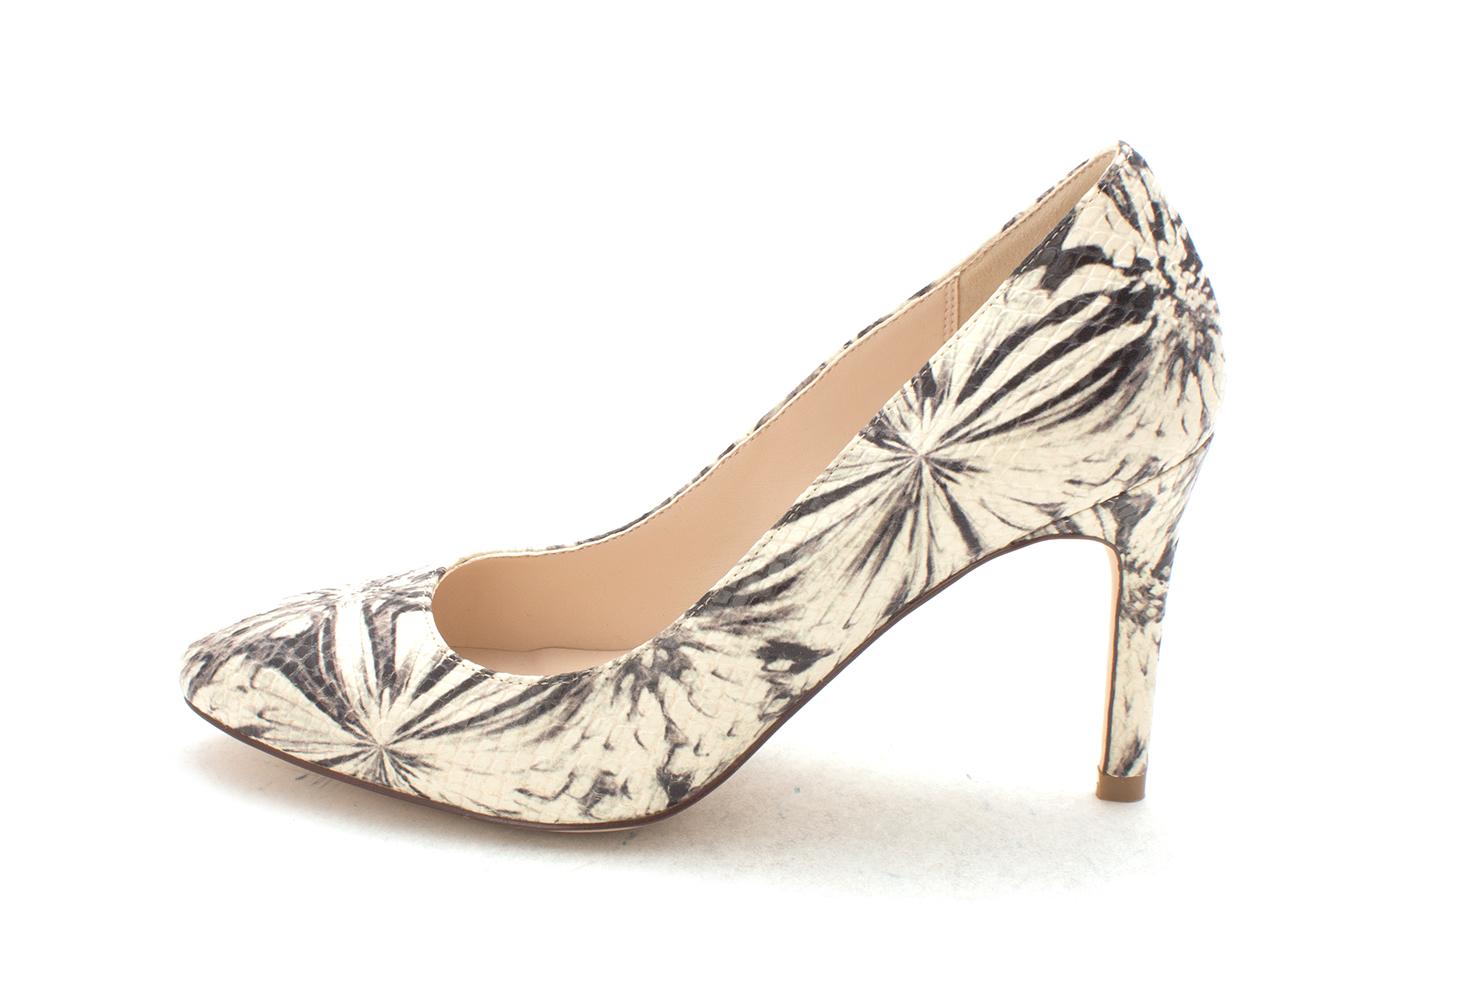 Cole Haan Womens Ursinesam Closed Toe Classic Pumps Beige/Black Snake Size 6.0